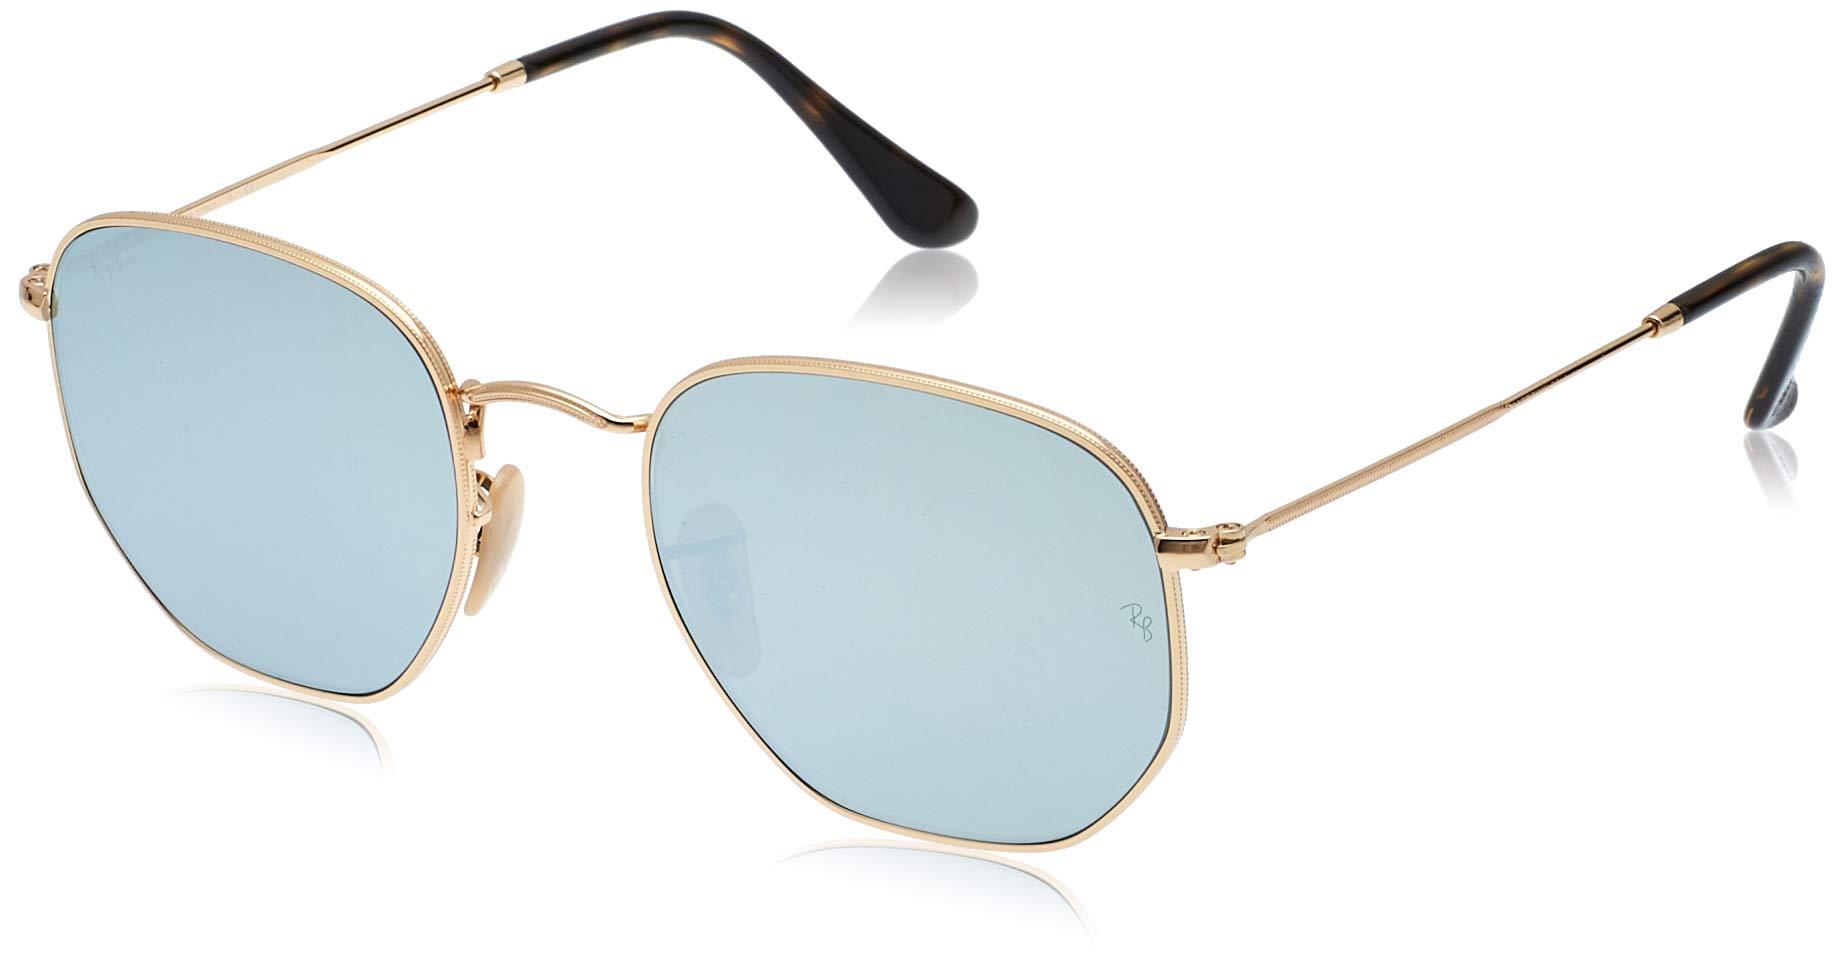 Ray-Ban Women's Rb3548n Hexagonal Flat Lenses Sunglasses